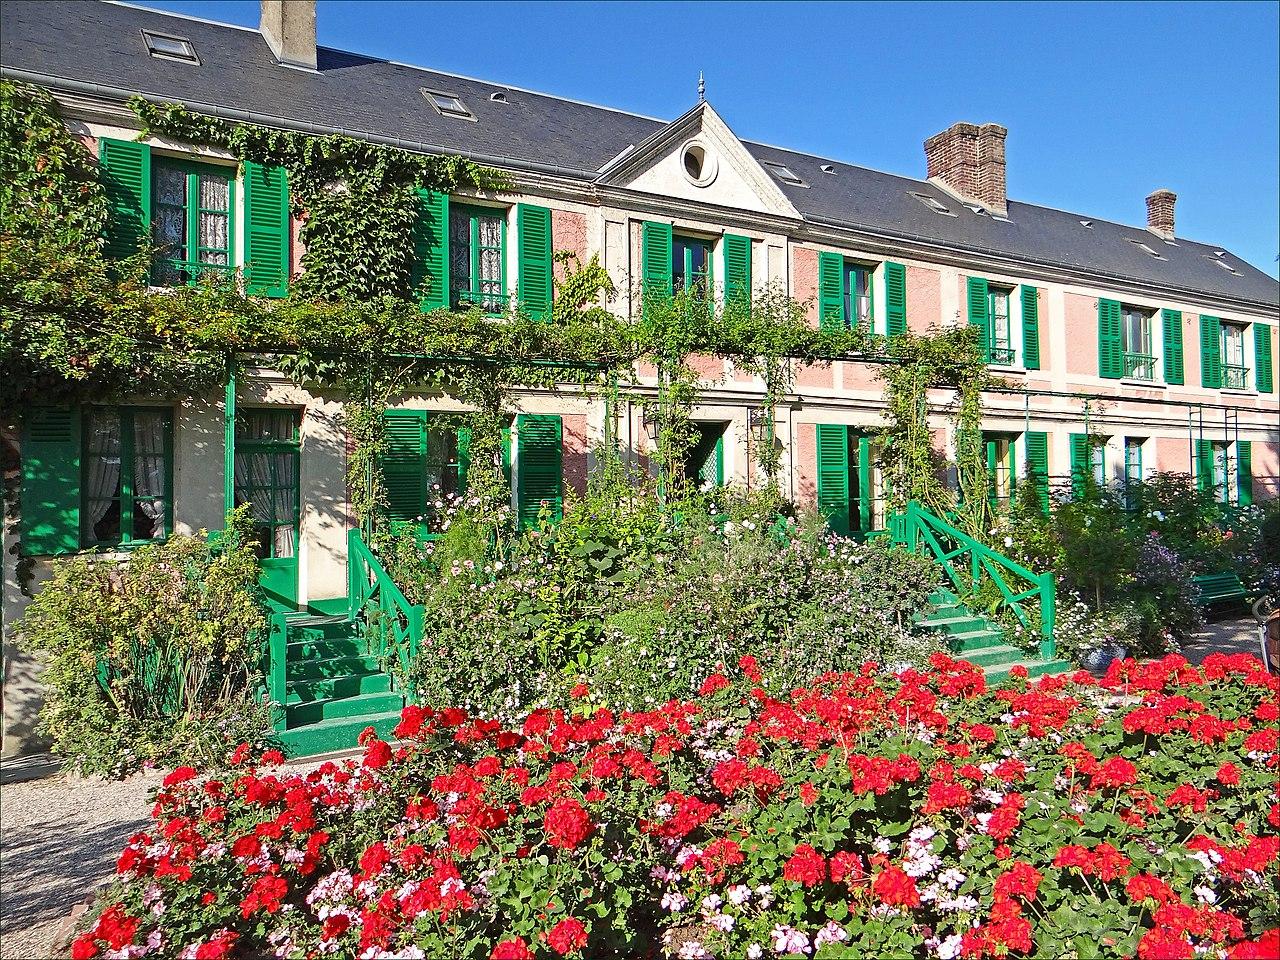 FileLa maison de Claude Monet Giverny 12.jpg ...